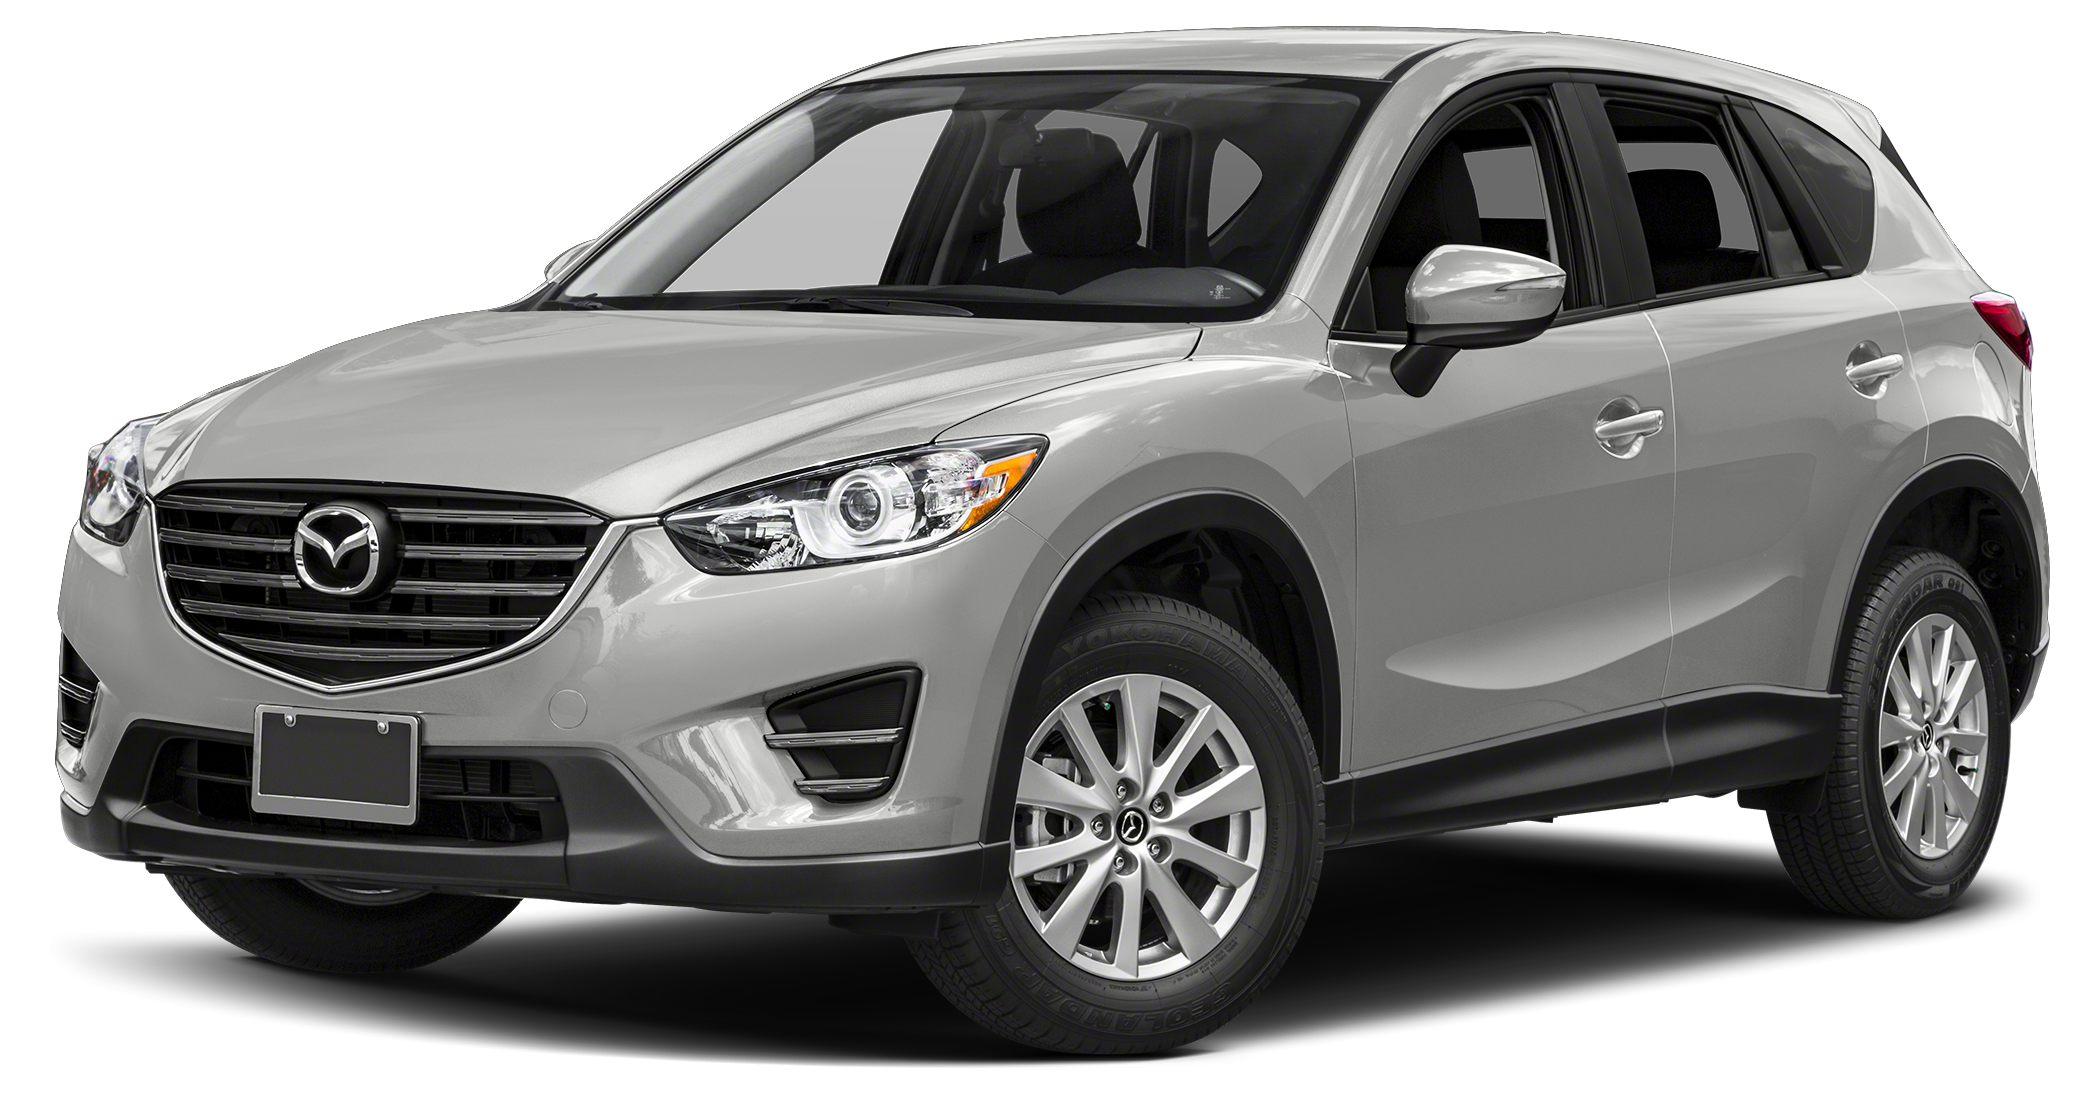 2016 Mazda CX-5 Sport 2016 Mazda CX-5 Sport in Sonic Silver Metallic Mazda FEVER Kia Store Annis